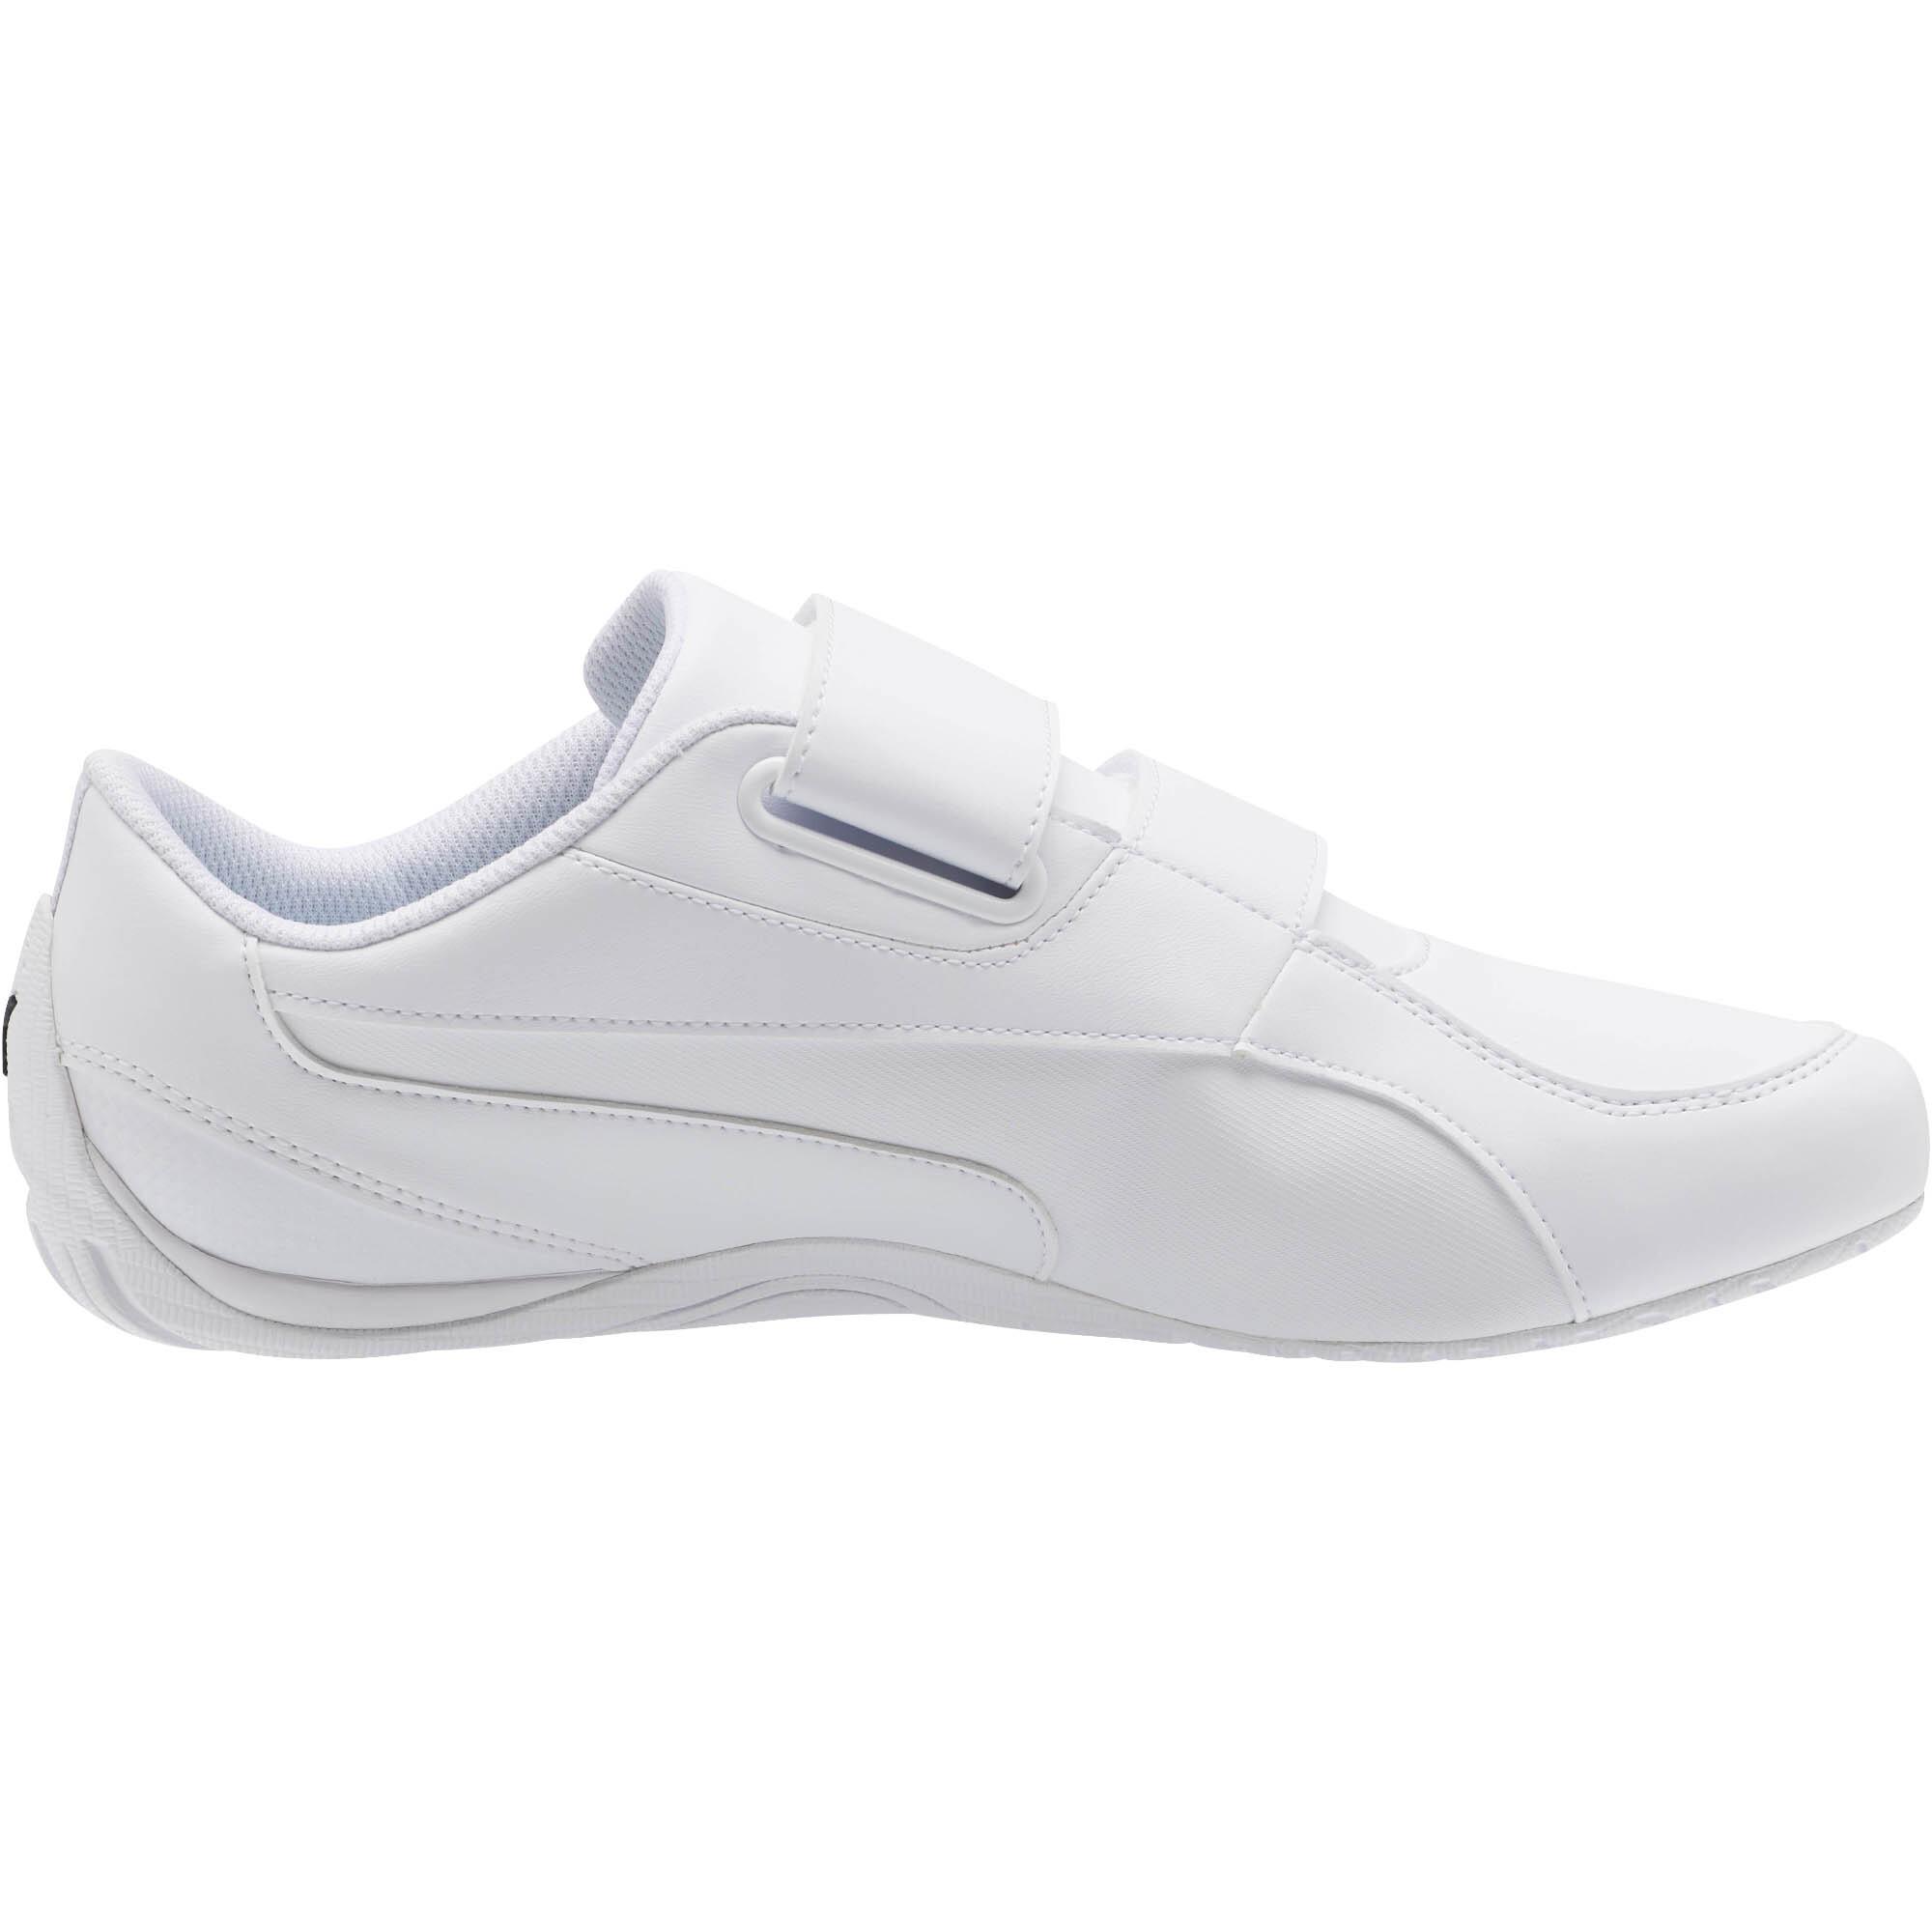 PUMA-Drift-Cat-5-AC-Men-039-s-Shoes-Unisex-Shoe-Basics miniatura 5